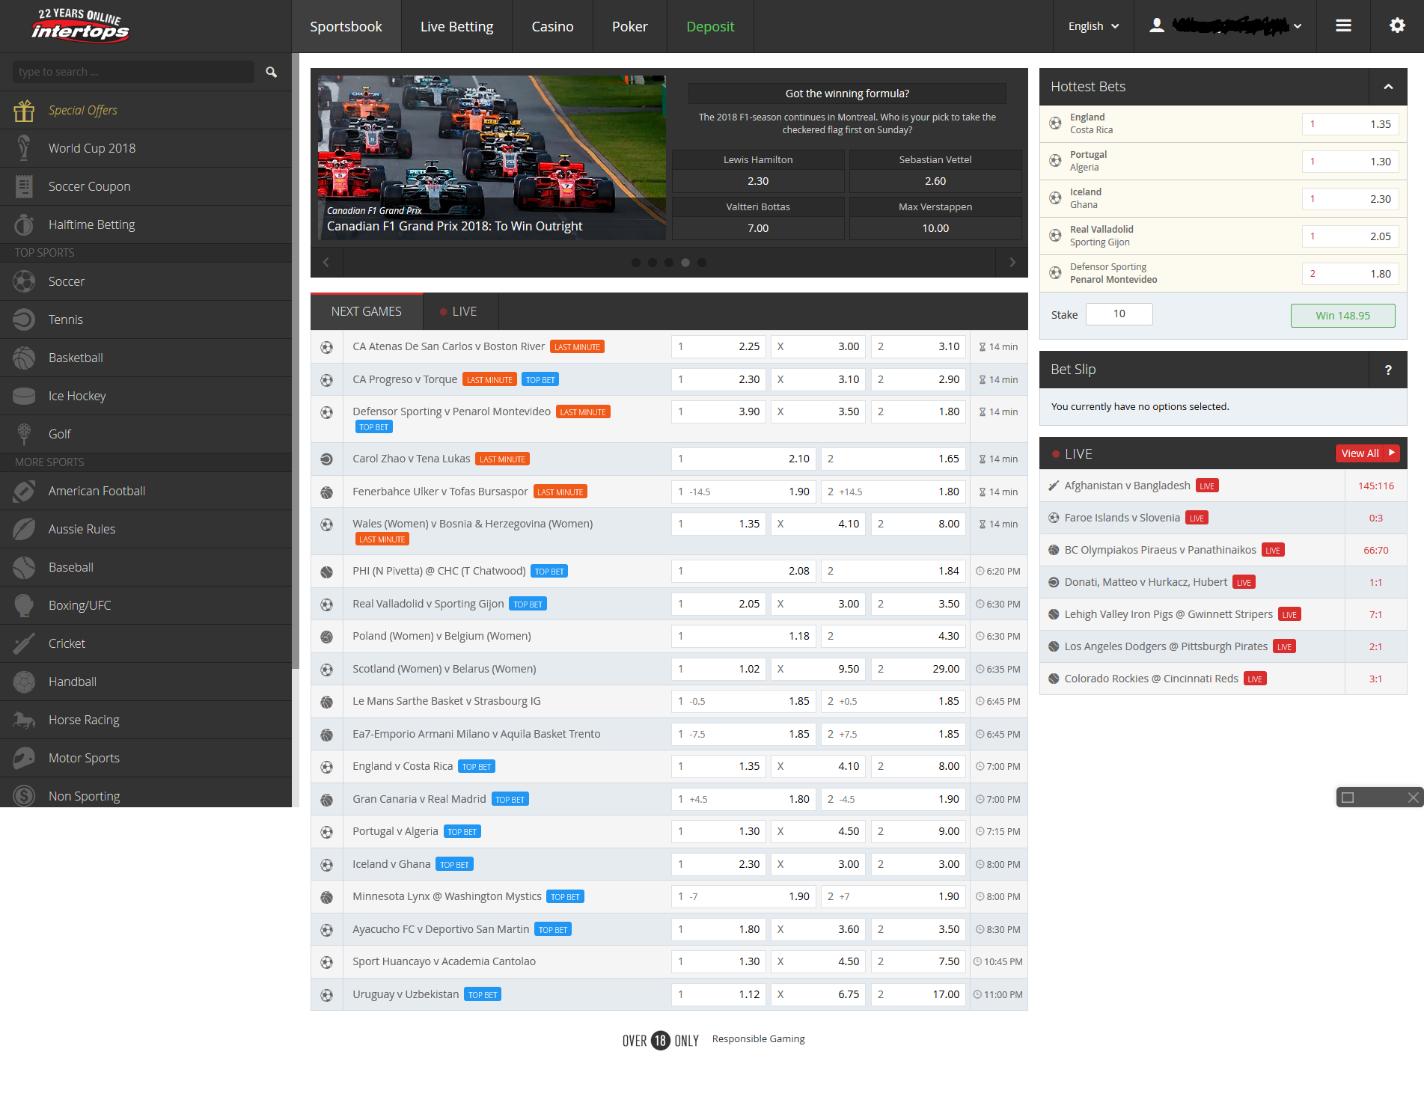 Intertops Bitcoin gambling site sportsbook